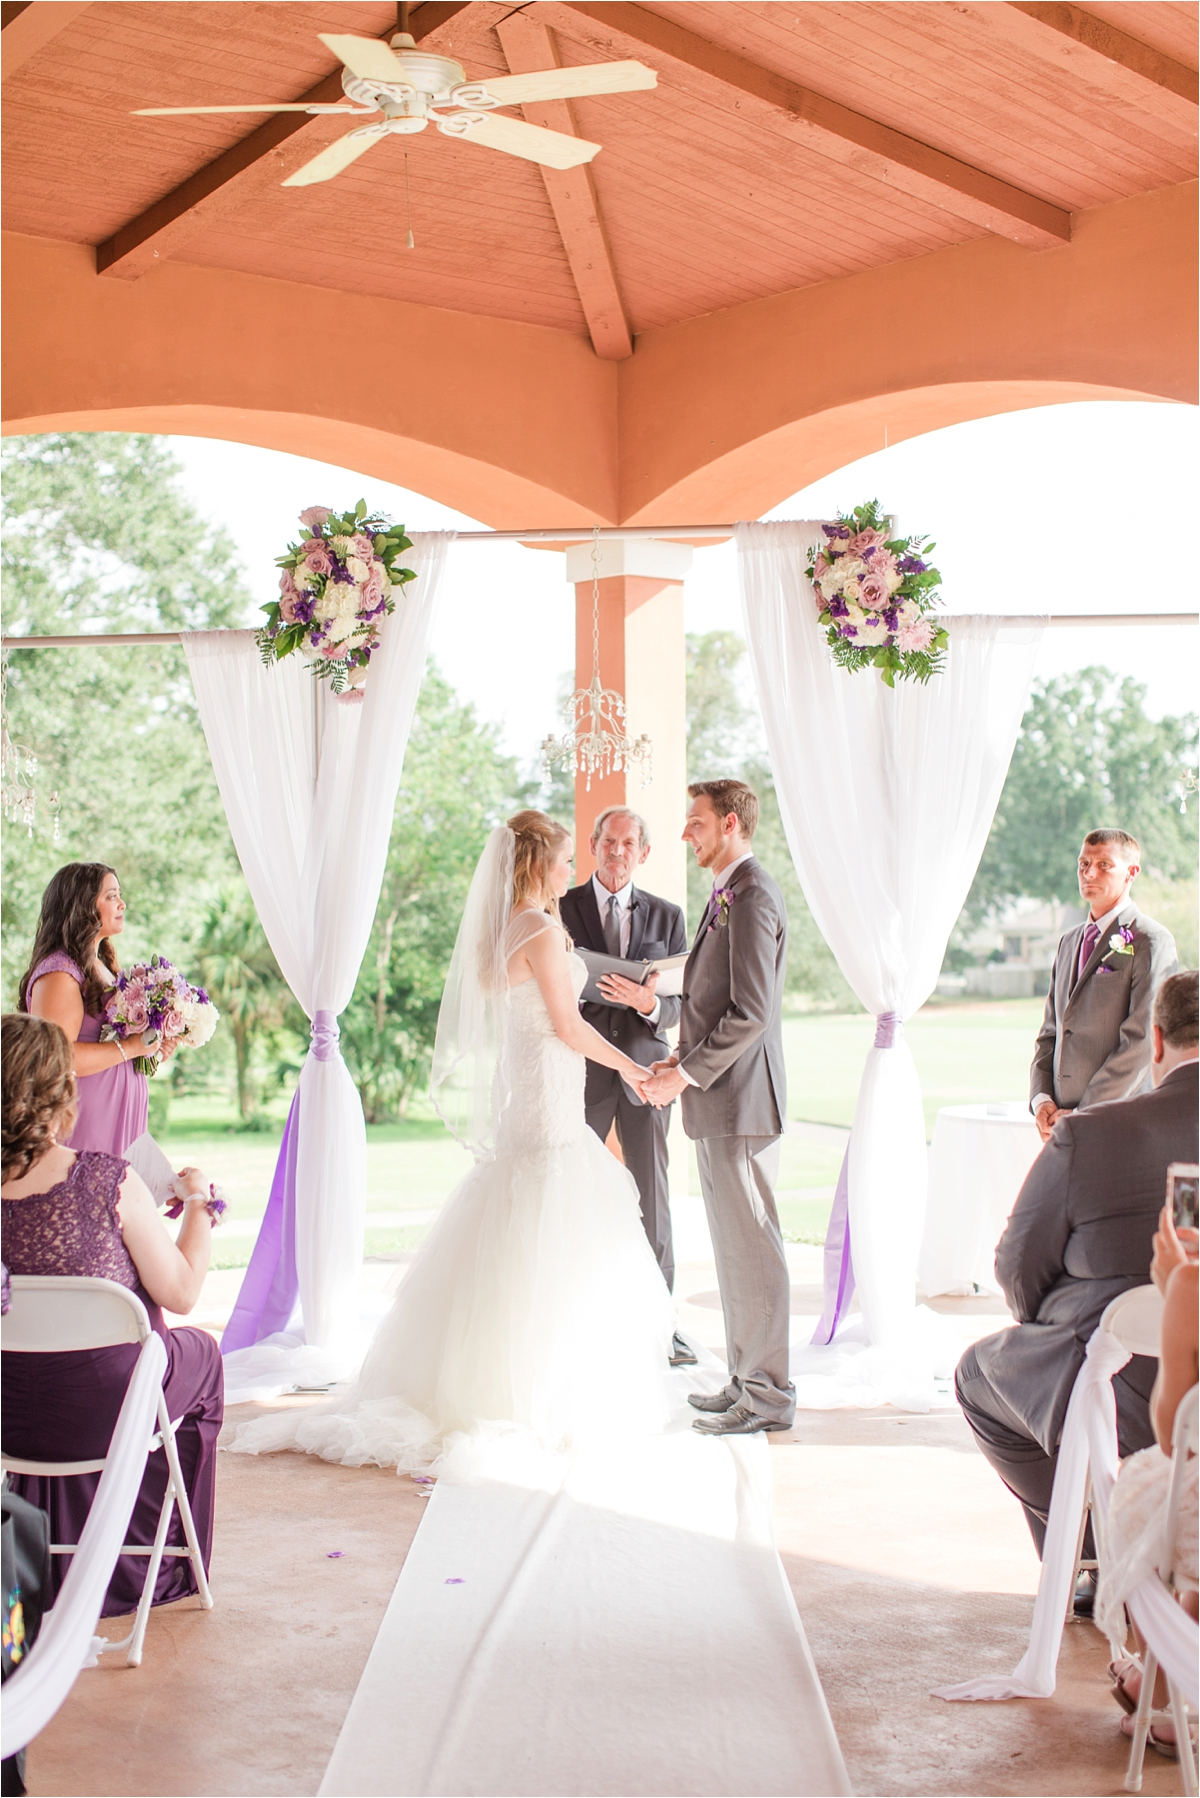 photos-bride-wedding-ceremony-alabama-photographer-lavender